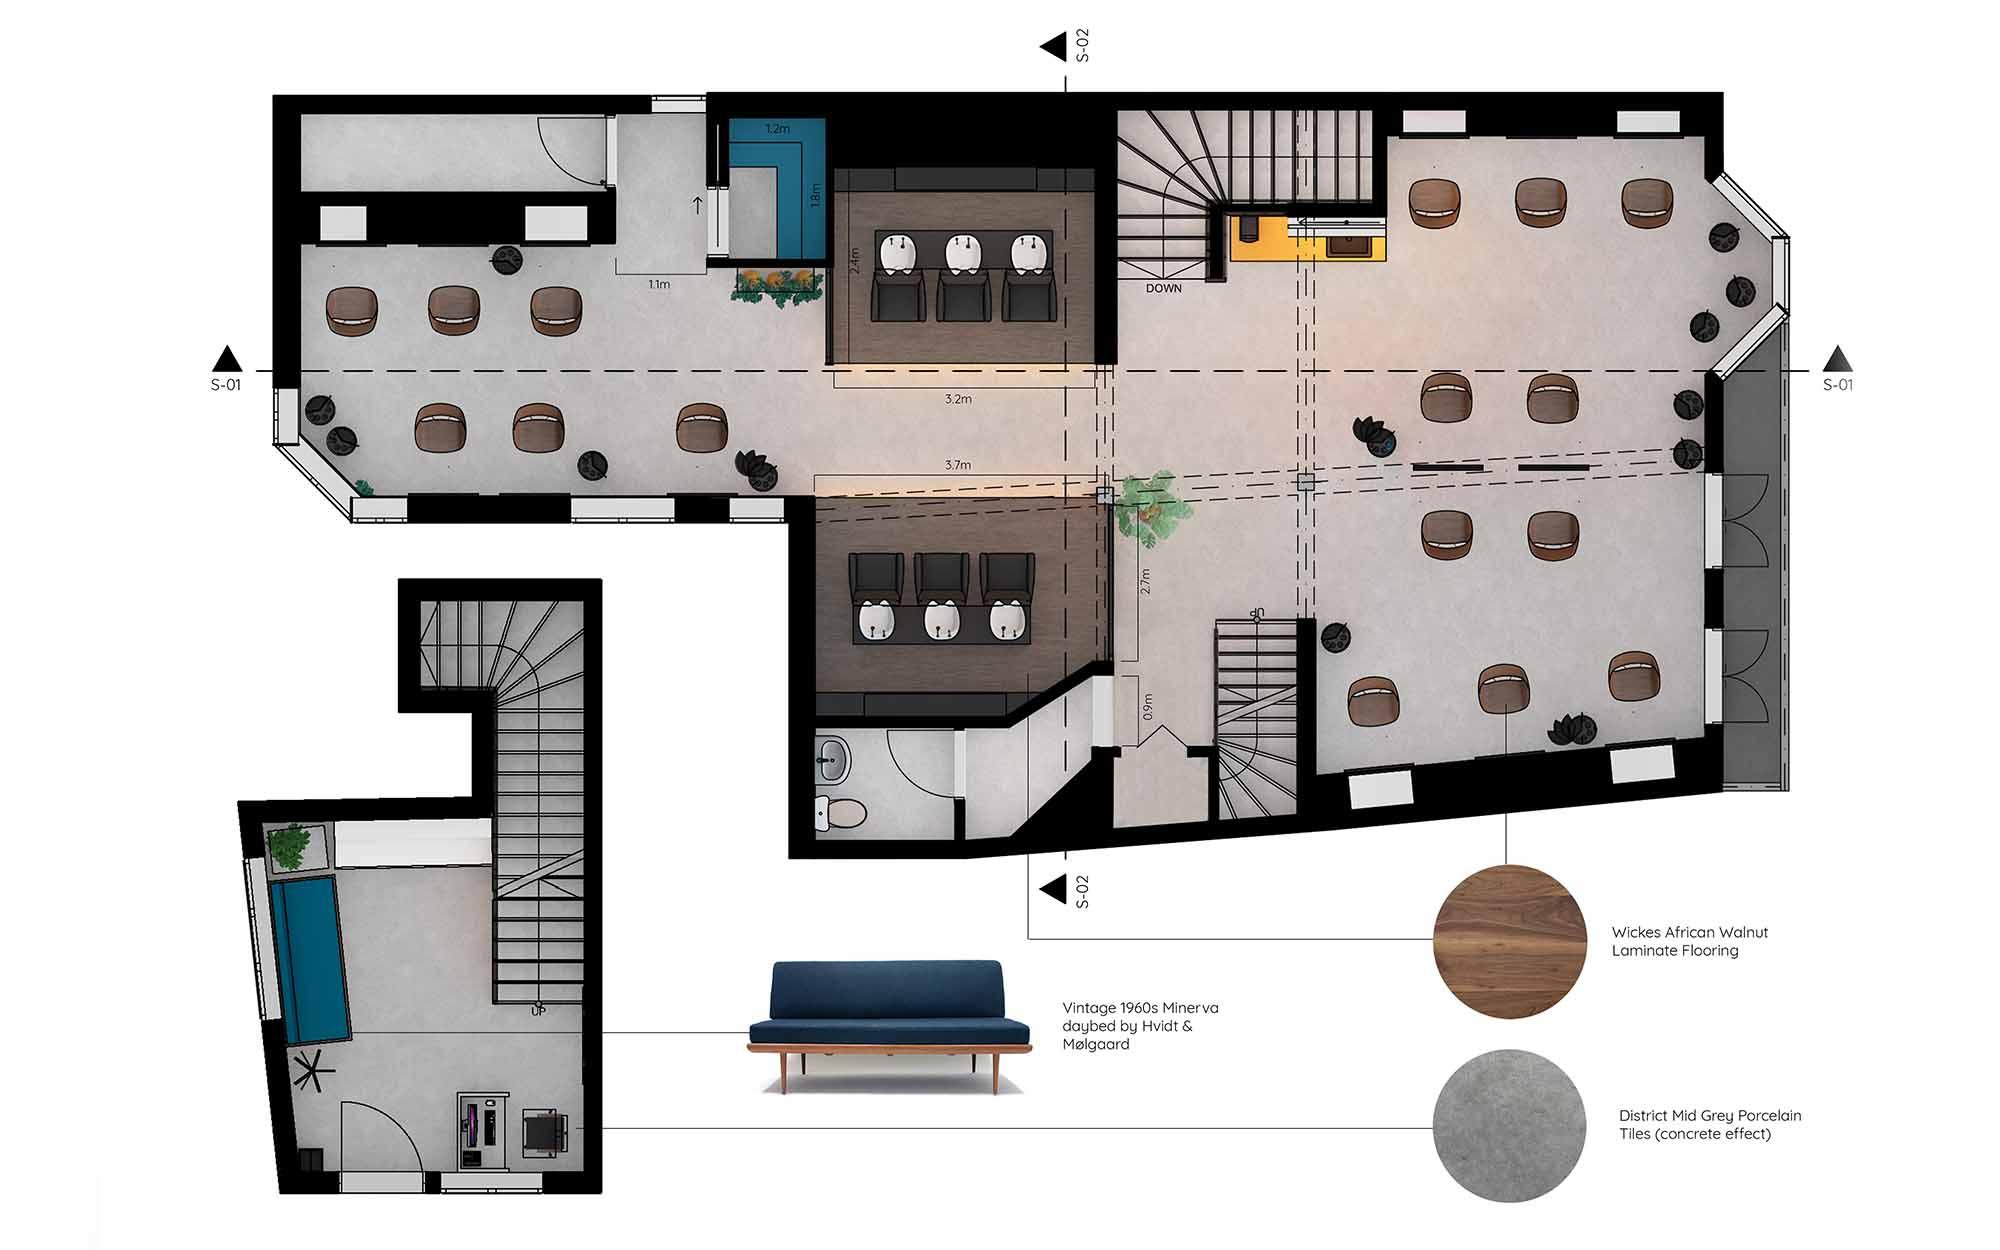 Elizabeth Barrell's render for the John Oliver refurbishment project